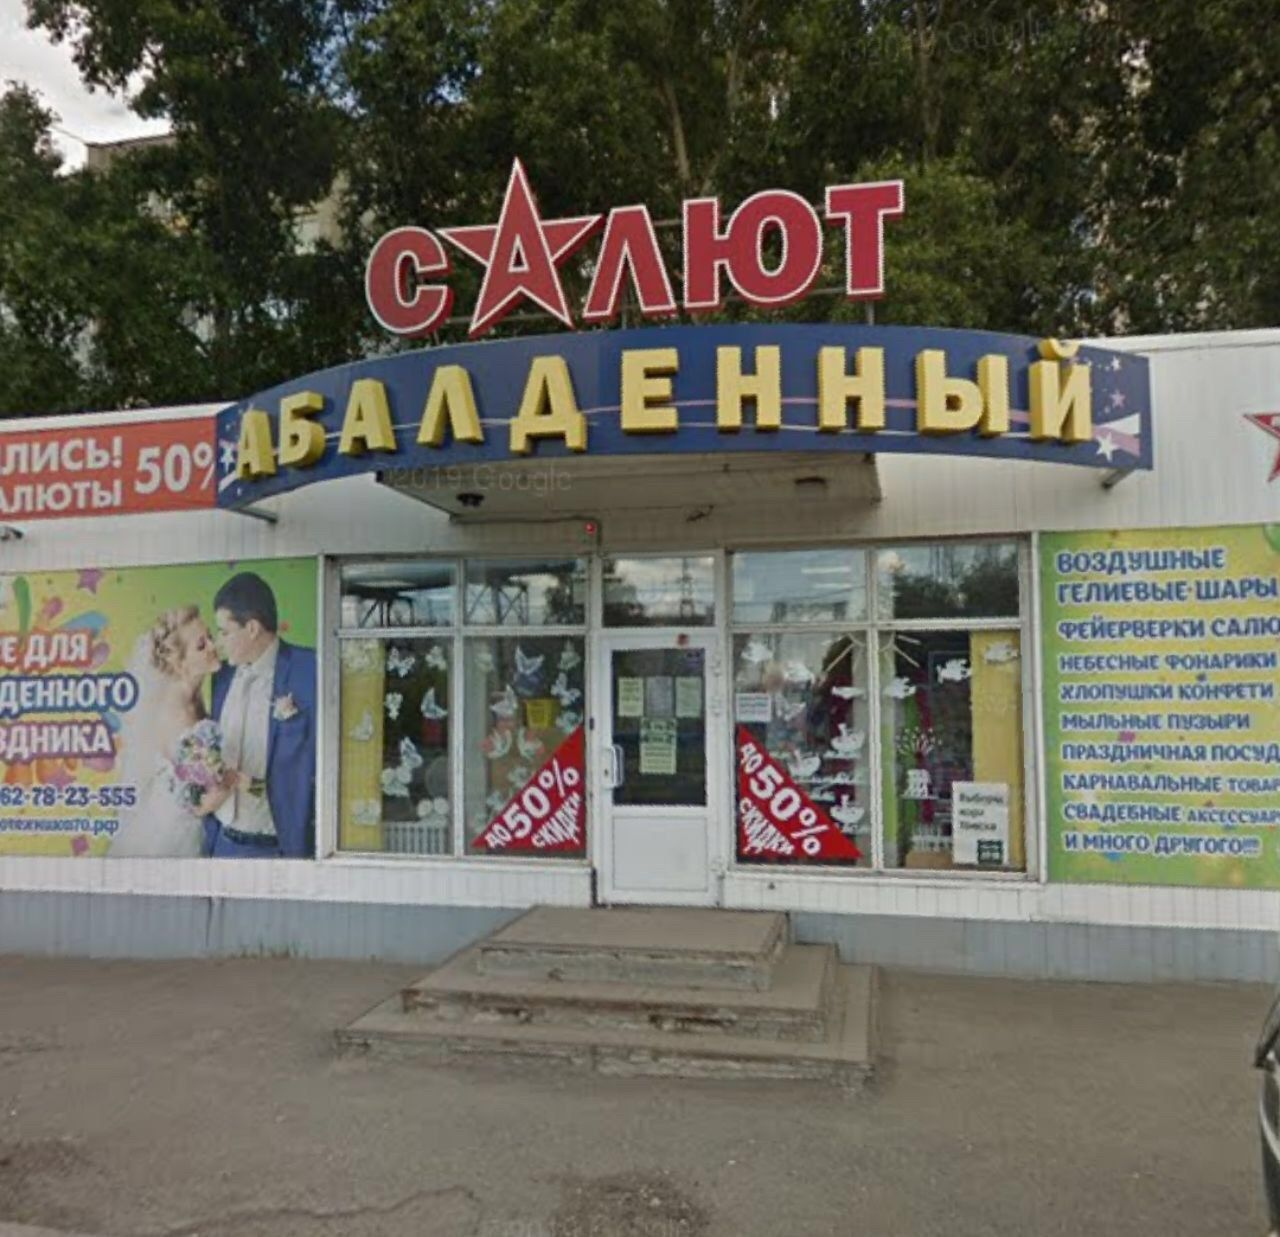 Абалденный Томск